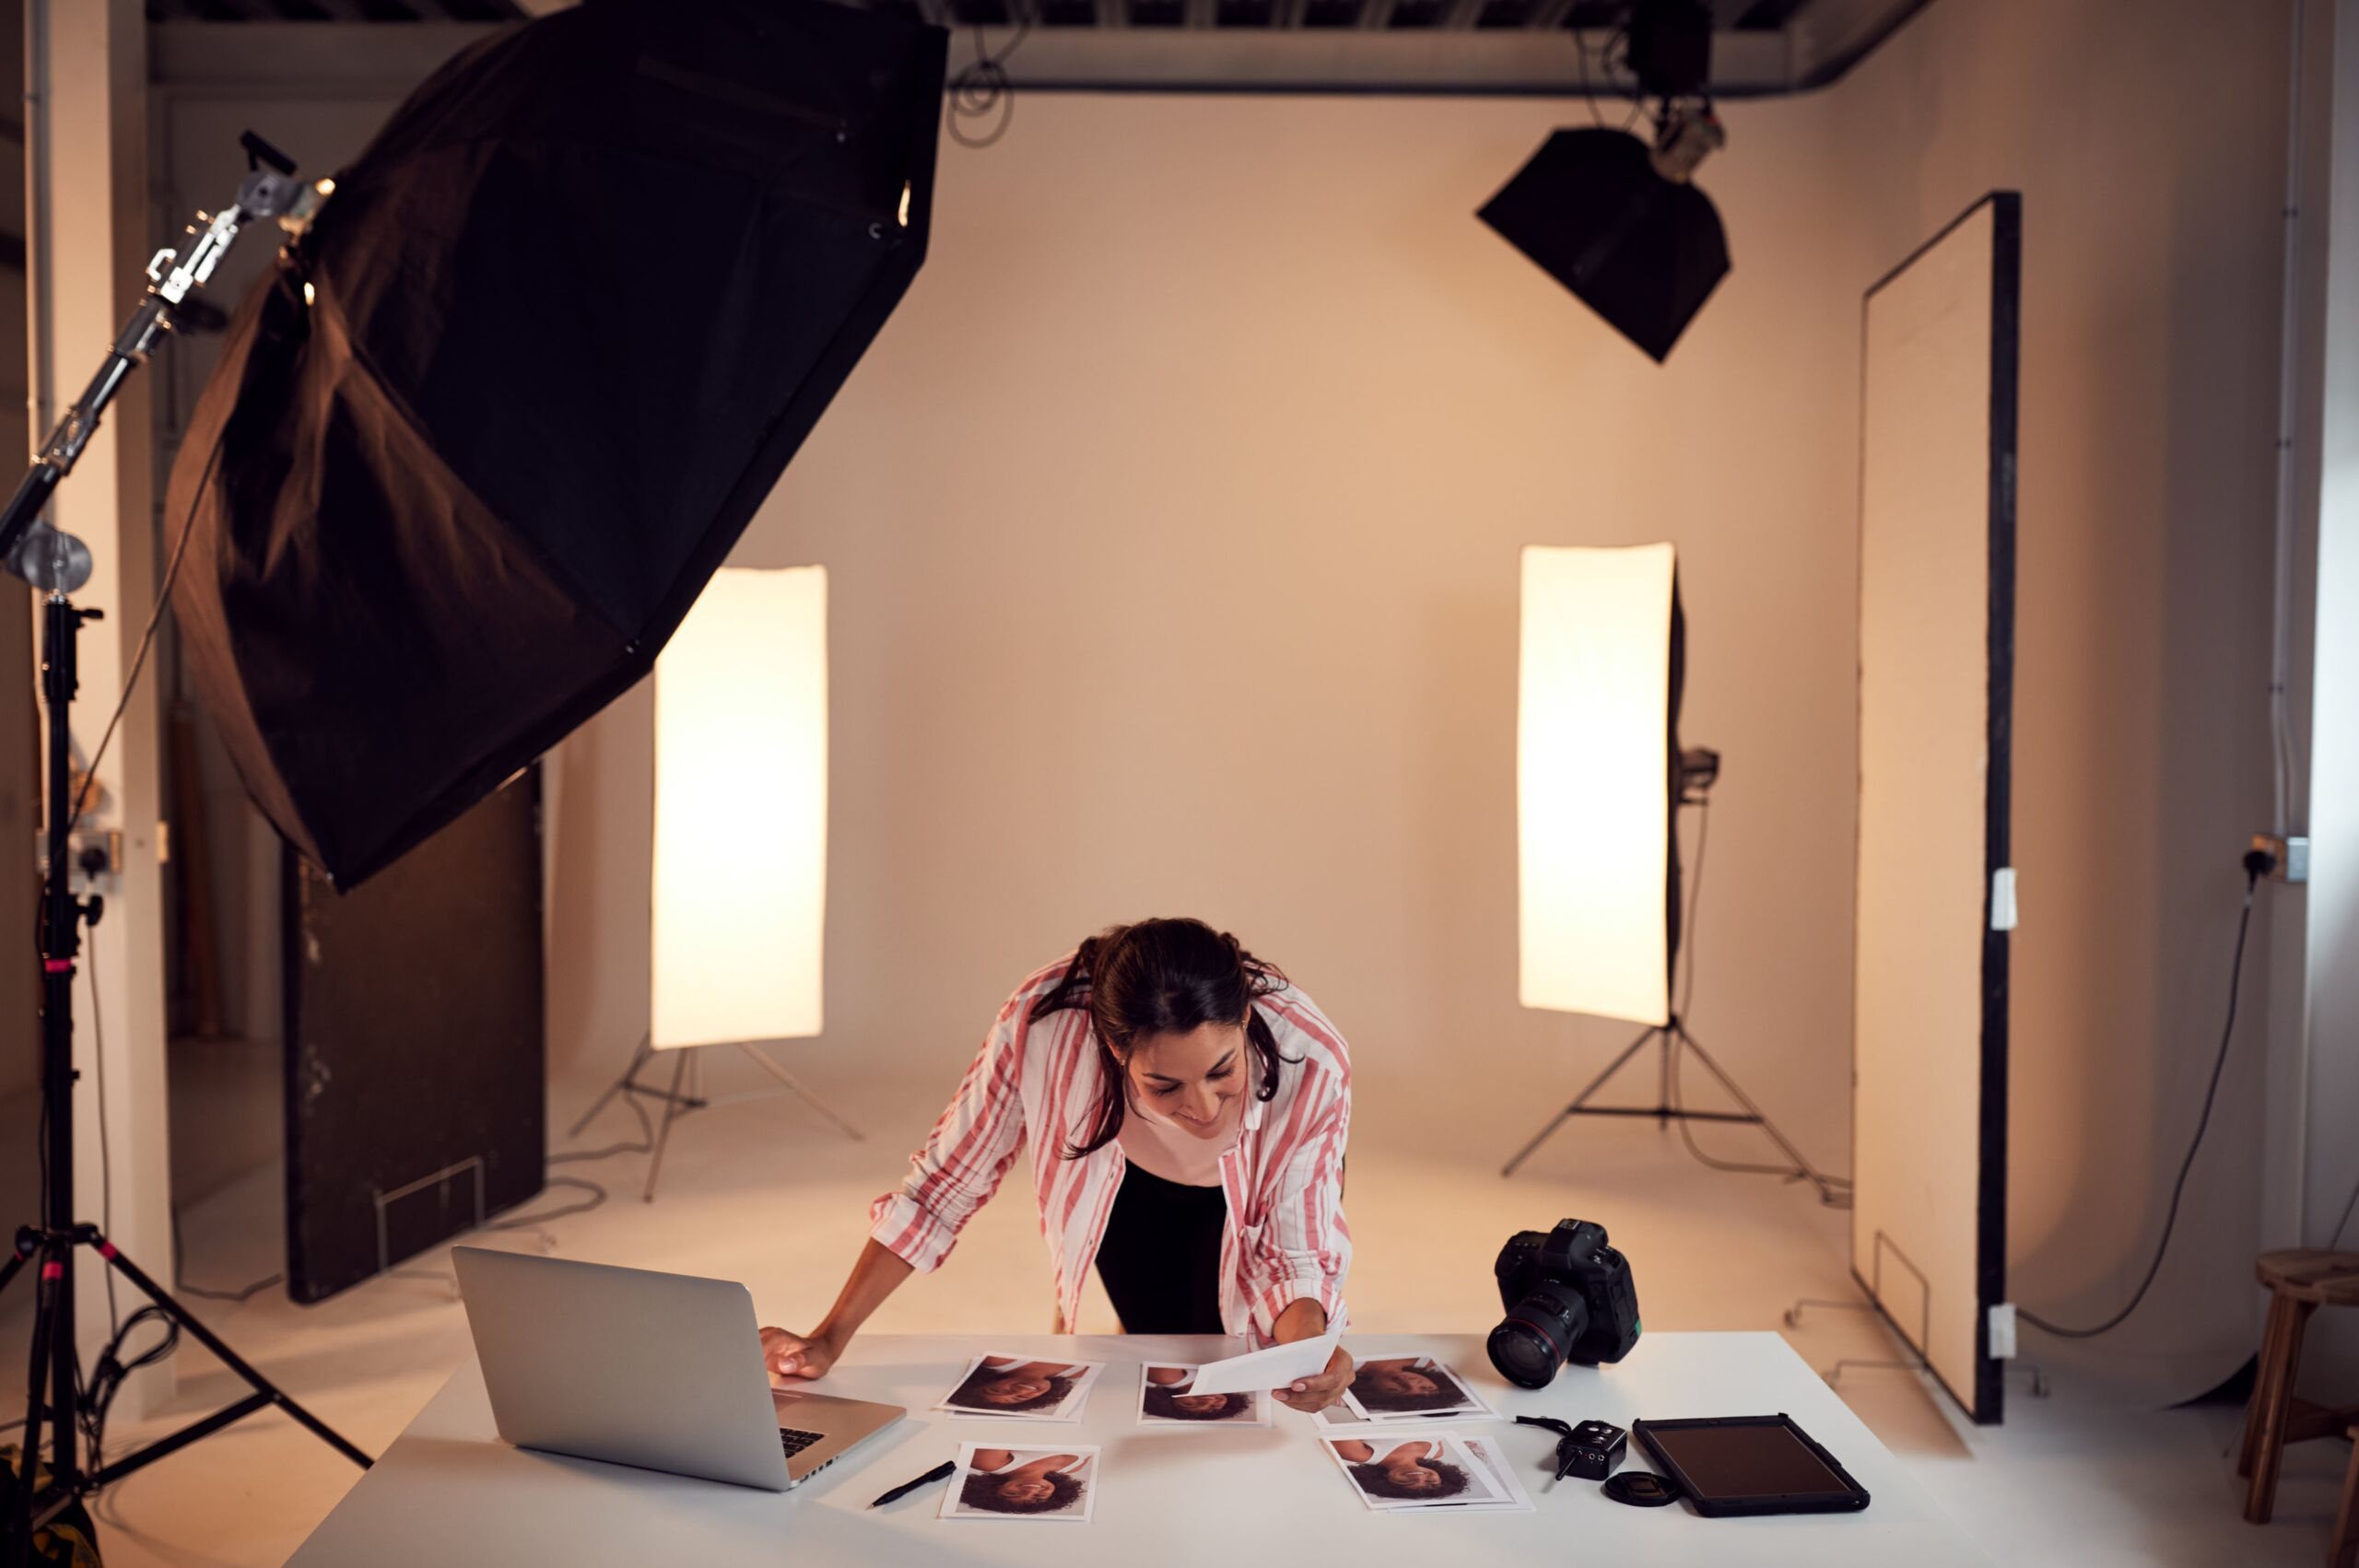 female photographer editing images from photo shoo J3GZWRS min scaled